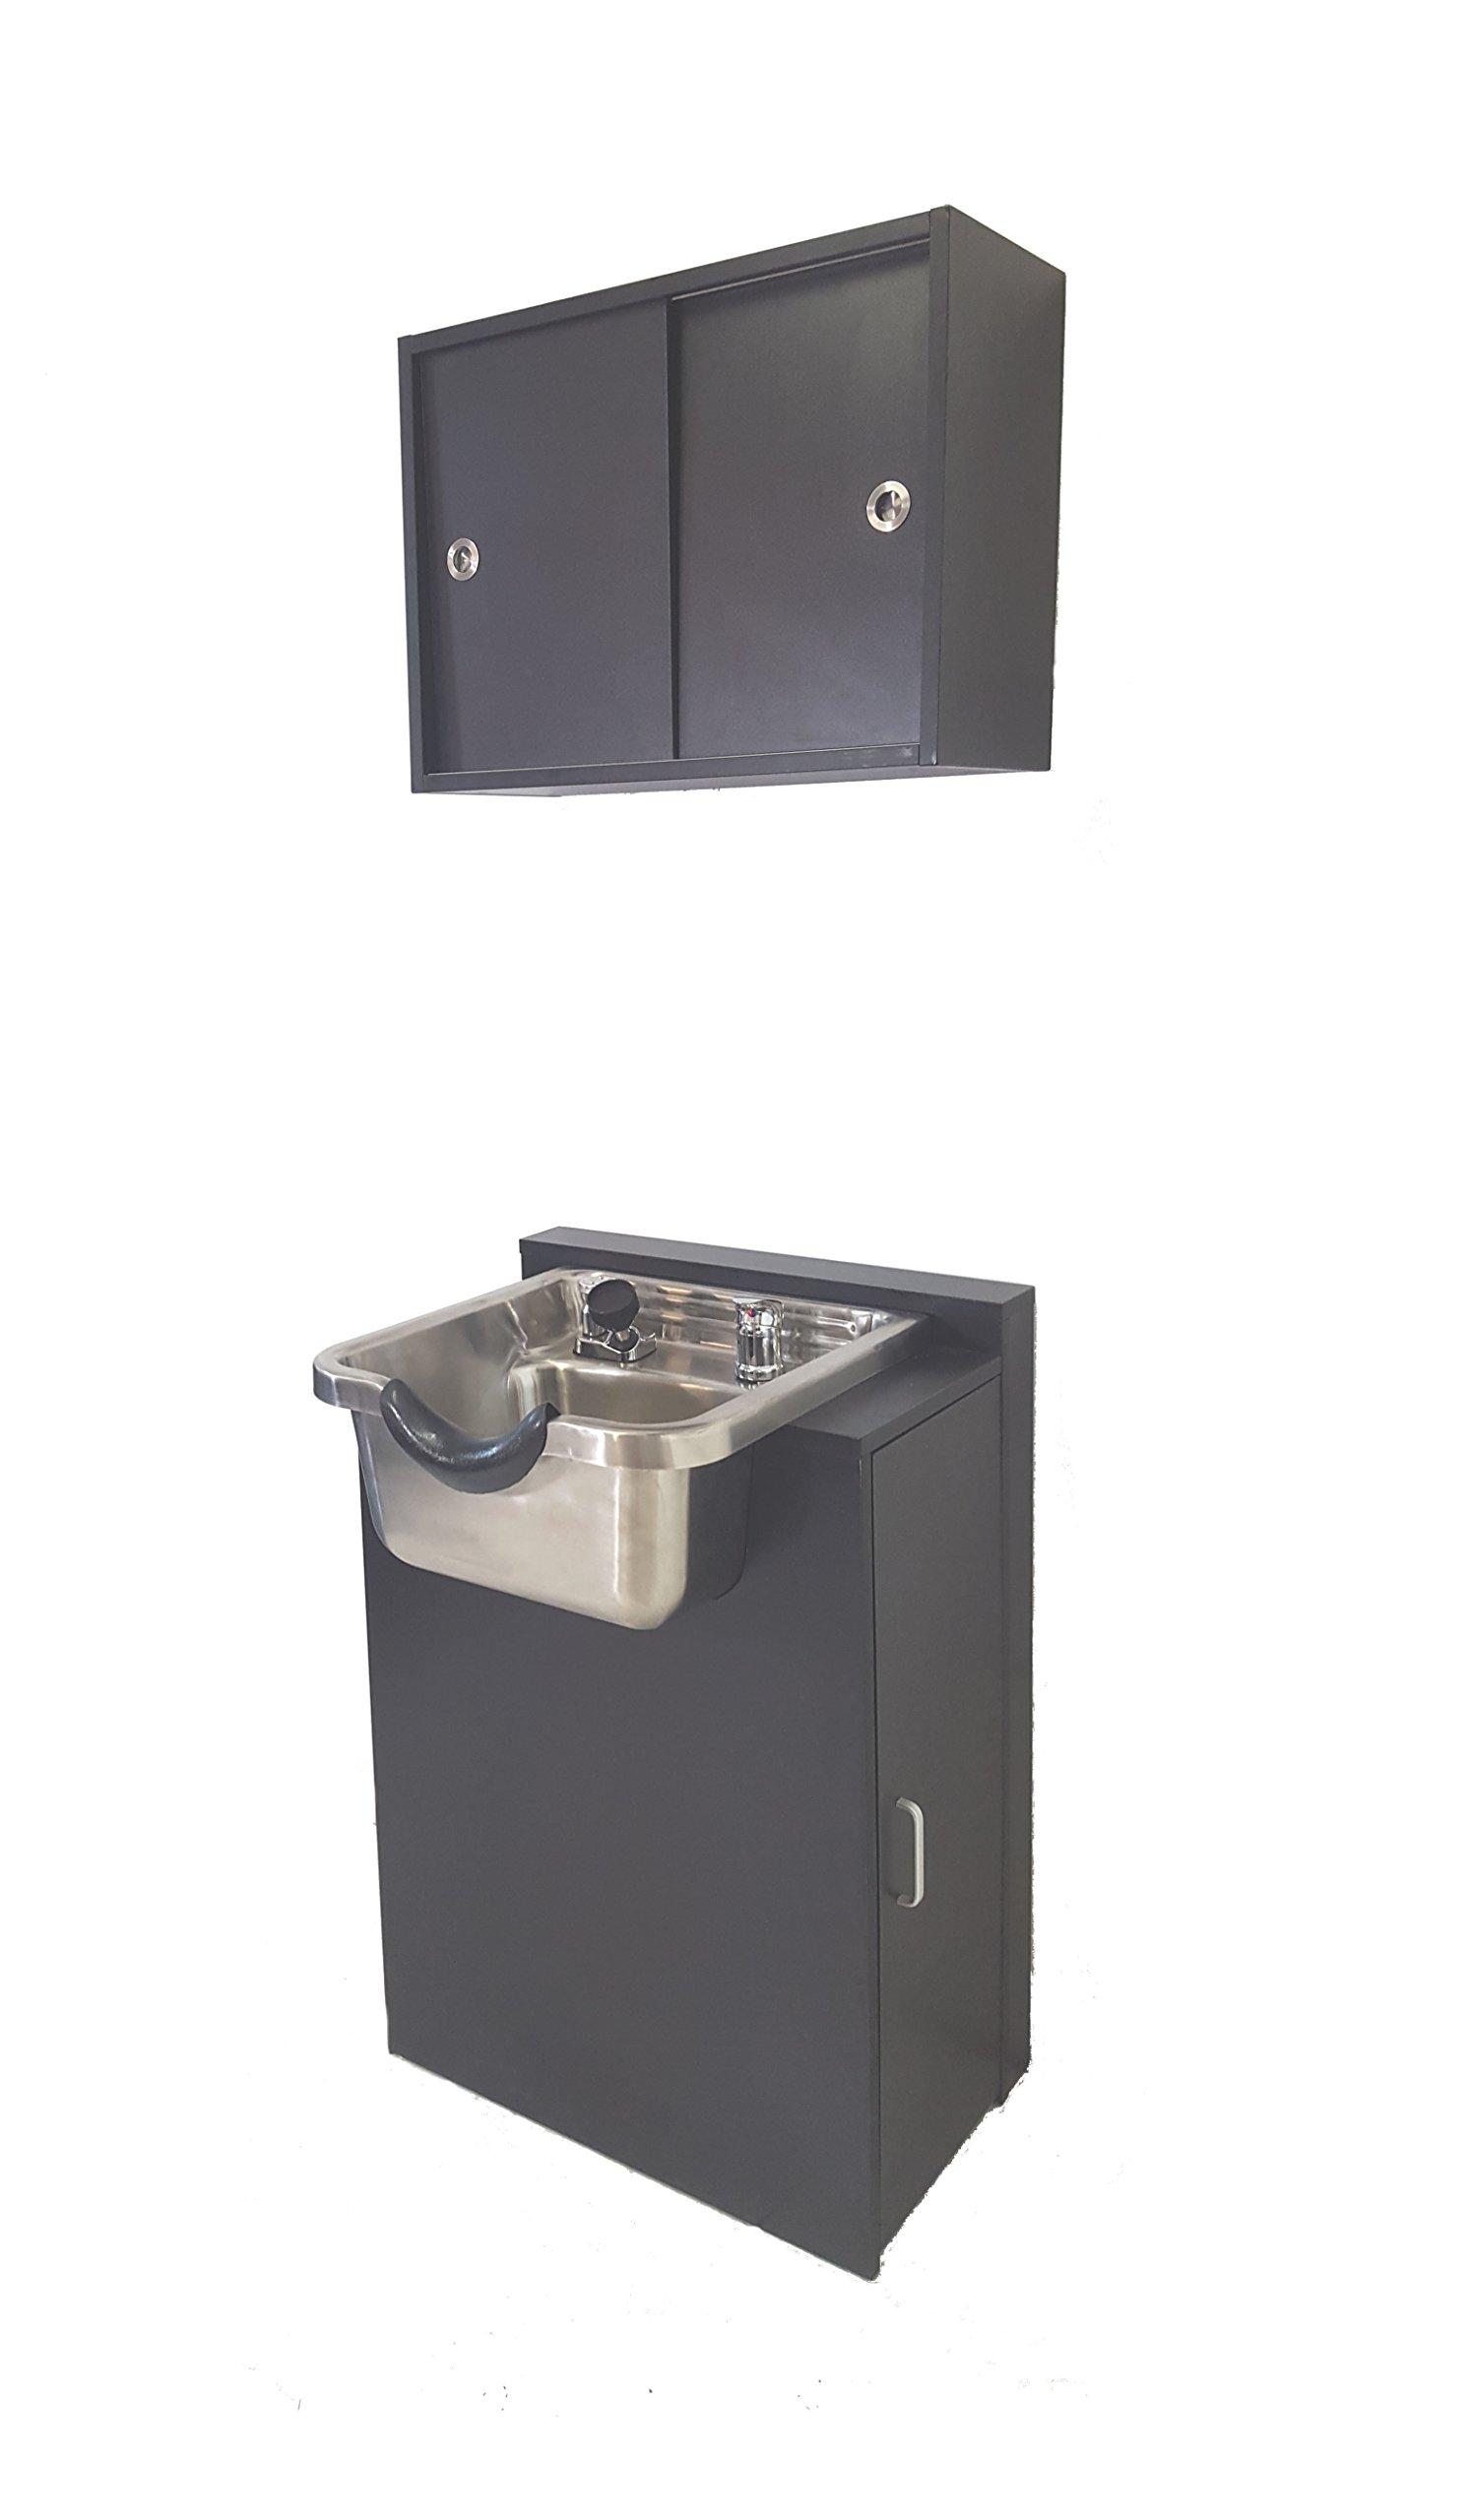 Stainless Steel Brushed Shampoo Bowl Floor & Towel Cabinet Package